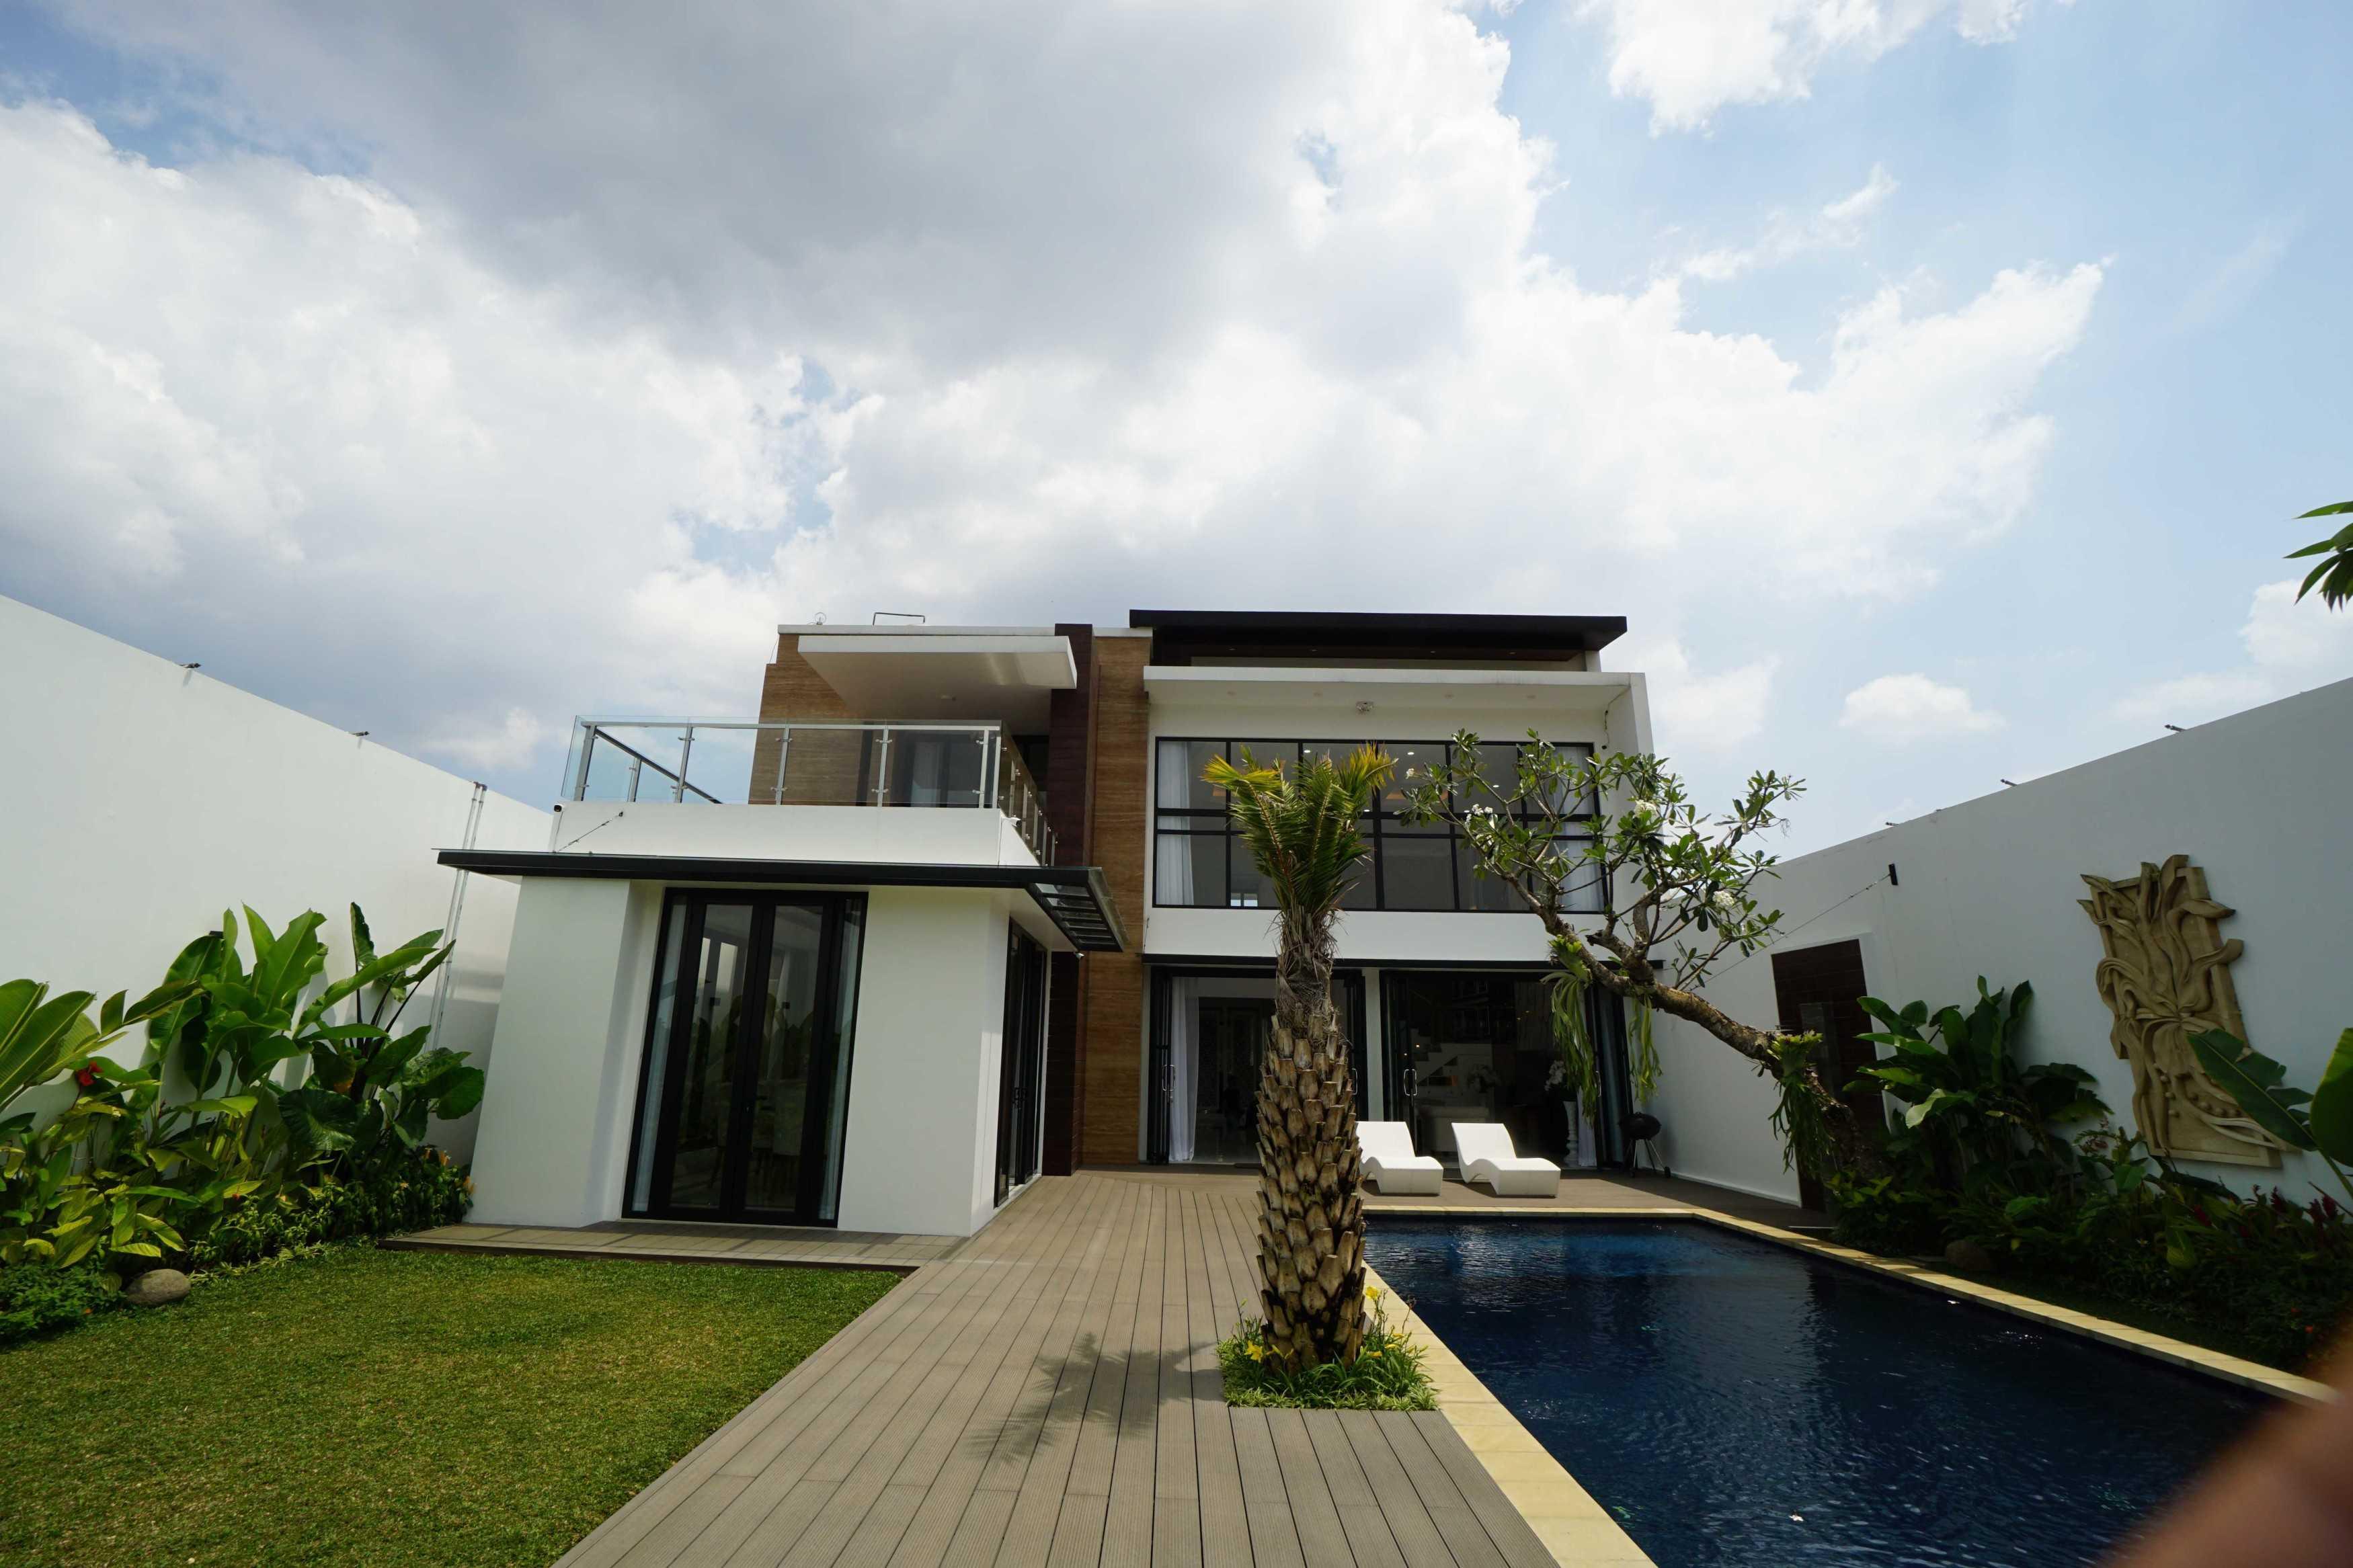 Emporio Architect Hasil Konstruksi Rumah Modern Tropis 363 @ Bandung Bandung, Kota Bandung, Jawa Barat, Indonesia Bandung, Kota Bandung, Jawa Barat, Indonesia Emporio-Architect-Hasil-Konstruksi-Rumah-Modern-Tropis-363-Bandung   82733